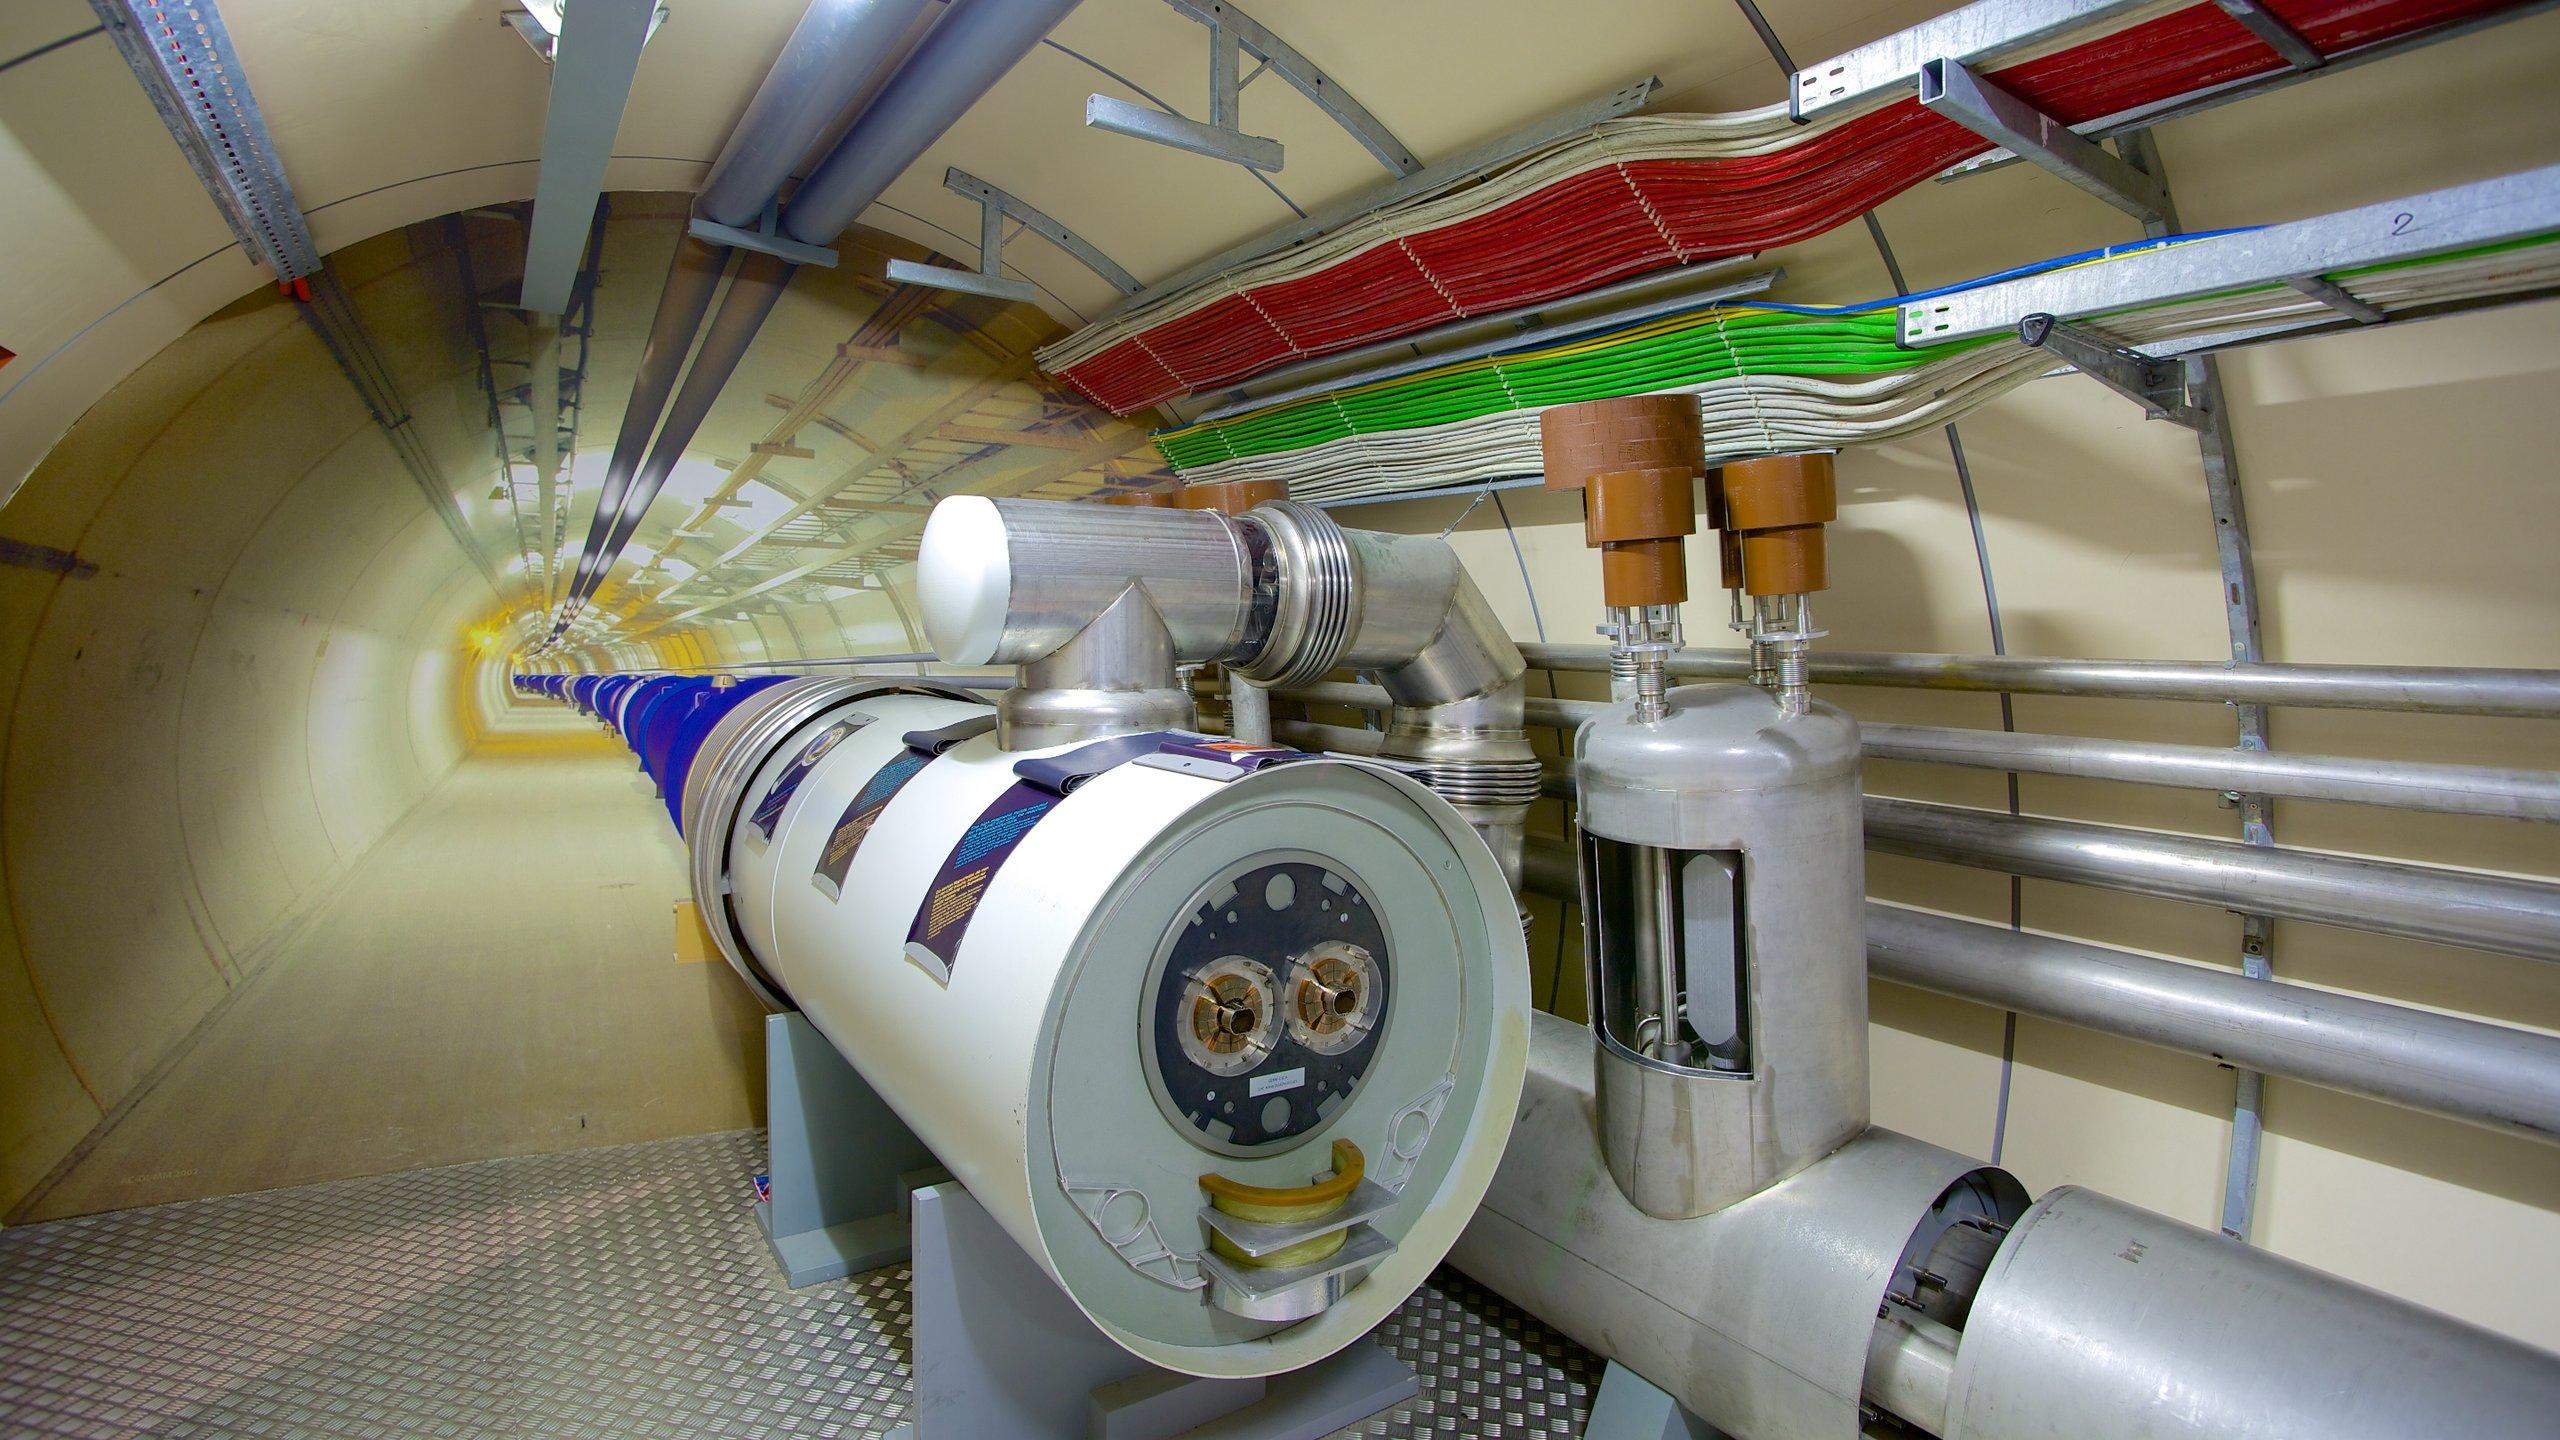 CERN, Meyrin, Canton of Geneva, Switzerland